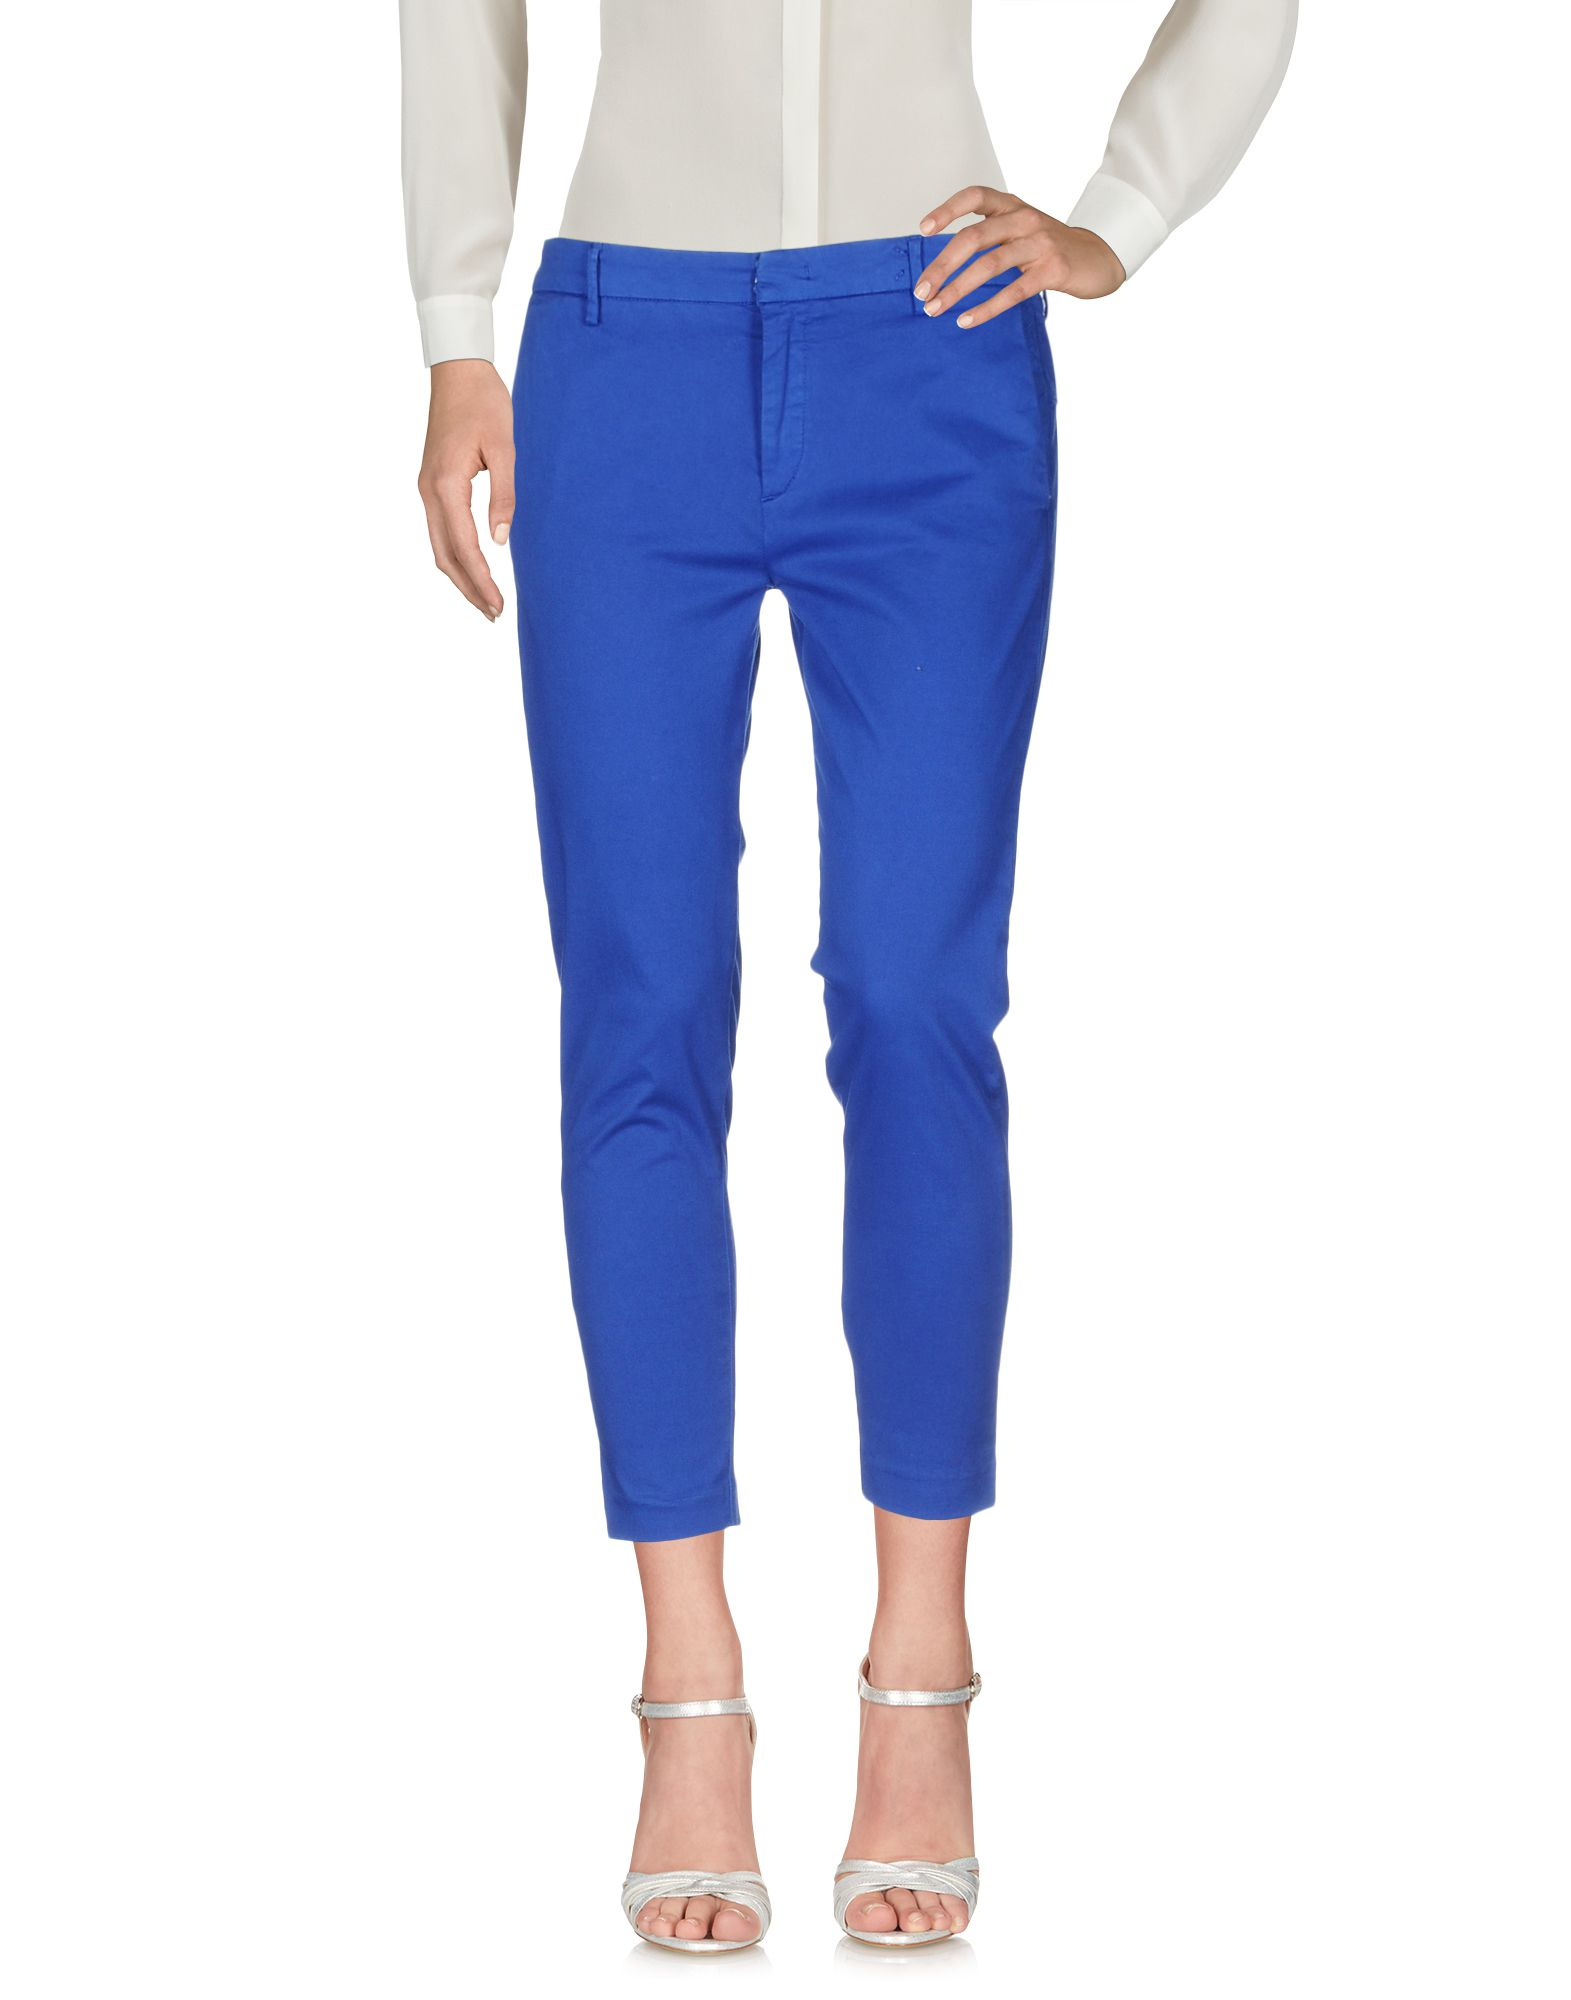 Pantalone Taperosso Maison Maison Clochard donna - 13126371VH  kosteneffizient